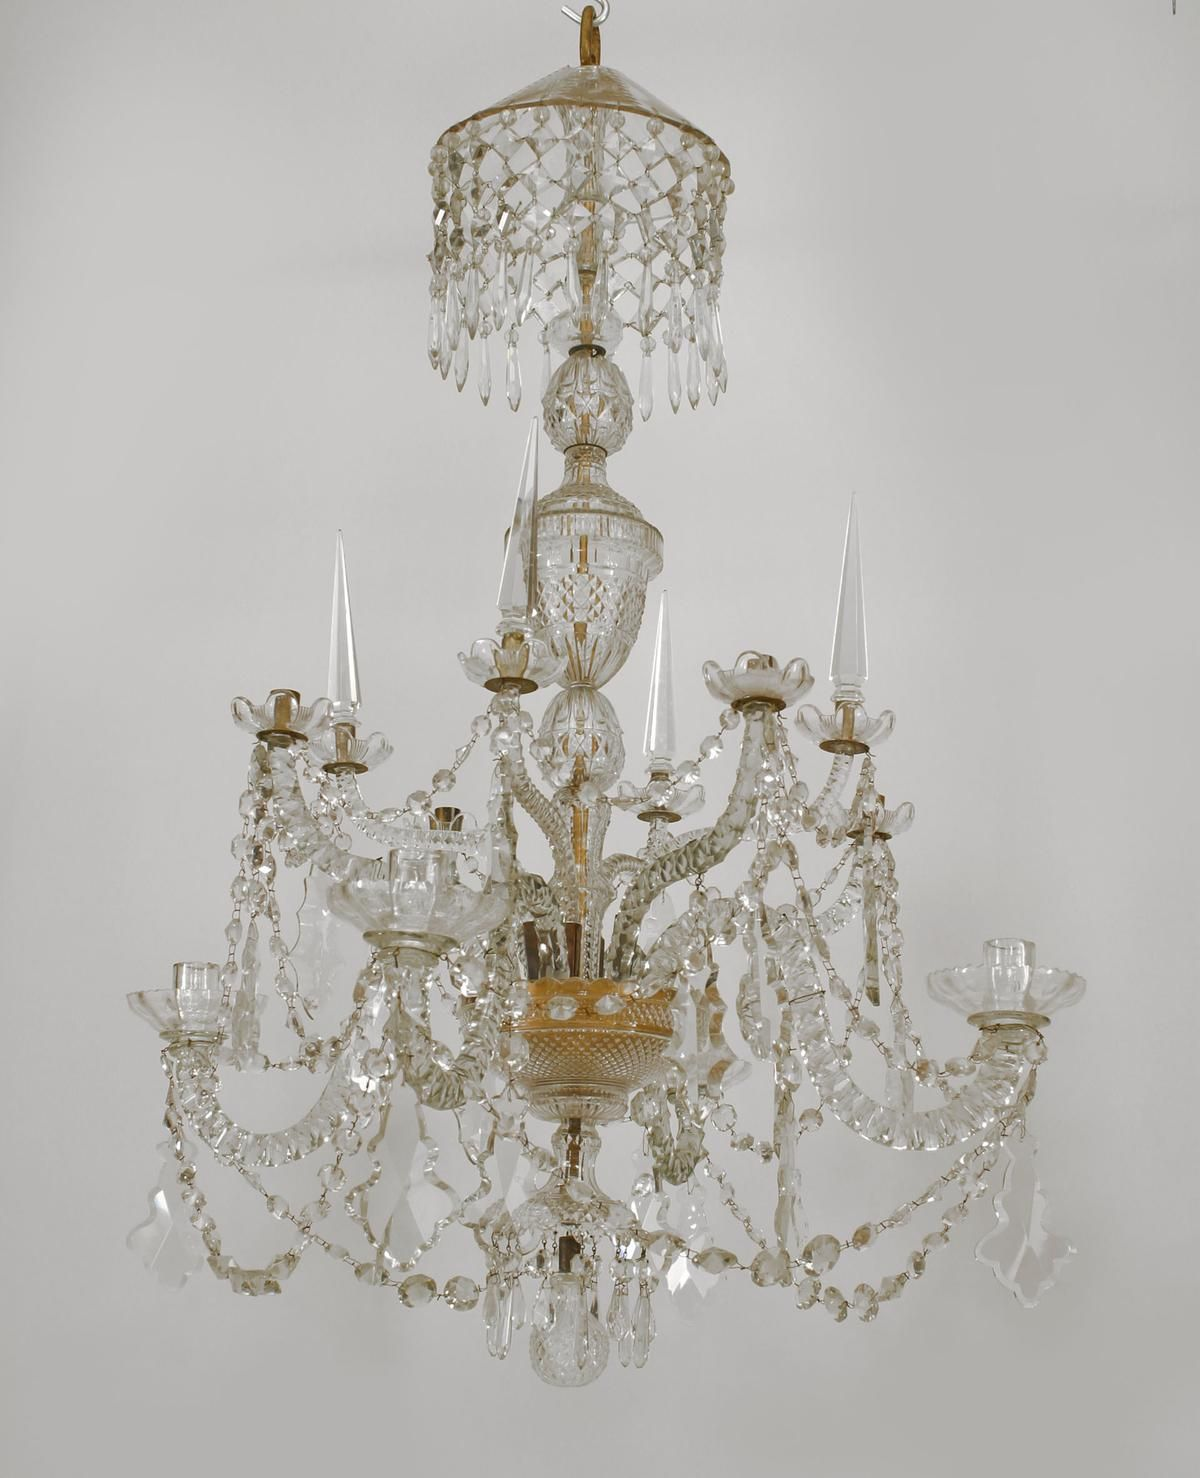 English georgian lighting chandelier crystal georgian english georgian lighting chandelier crystal arubaitofo Gallery